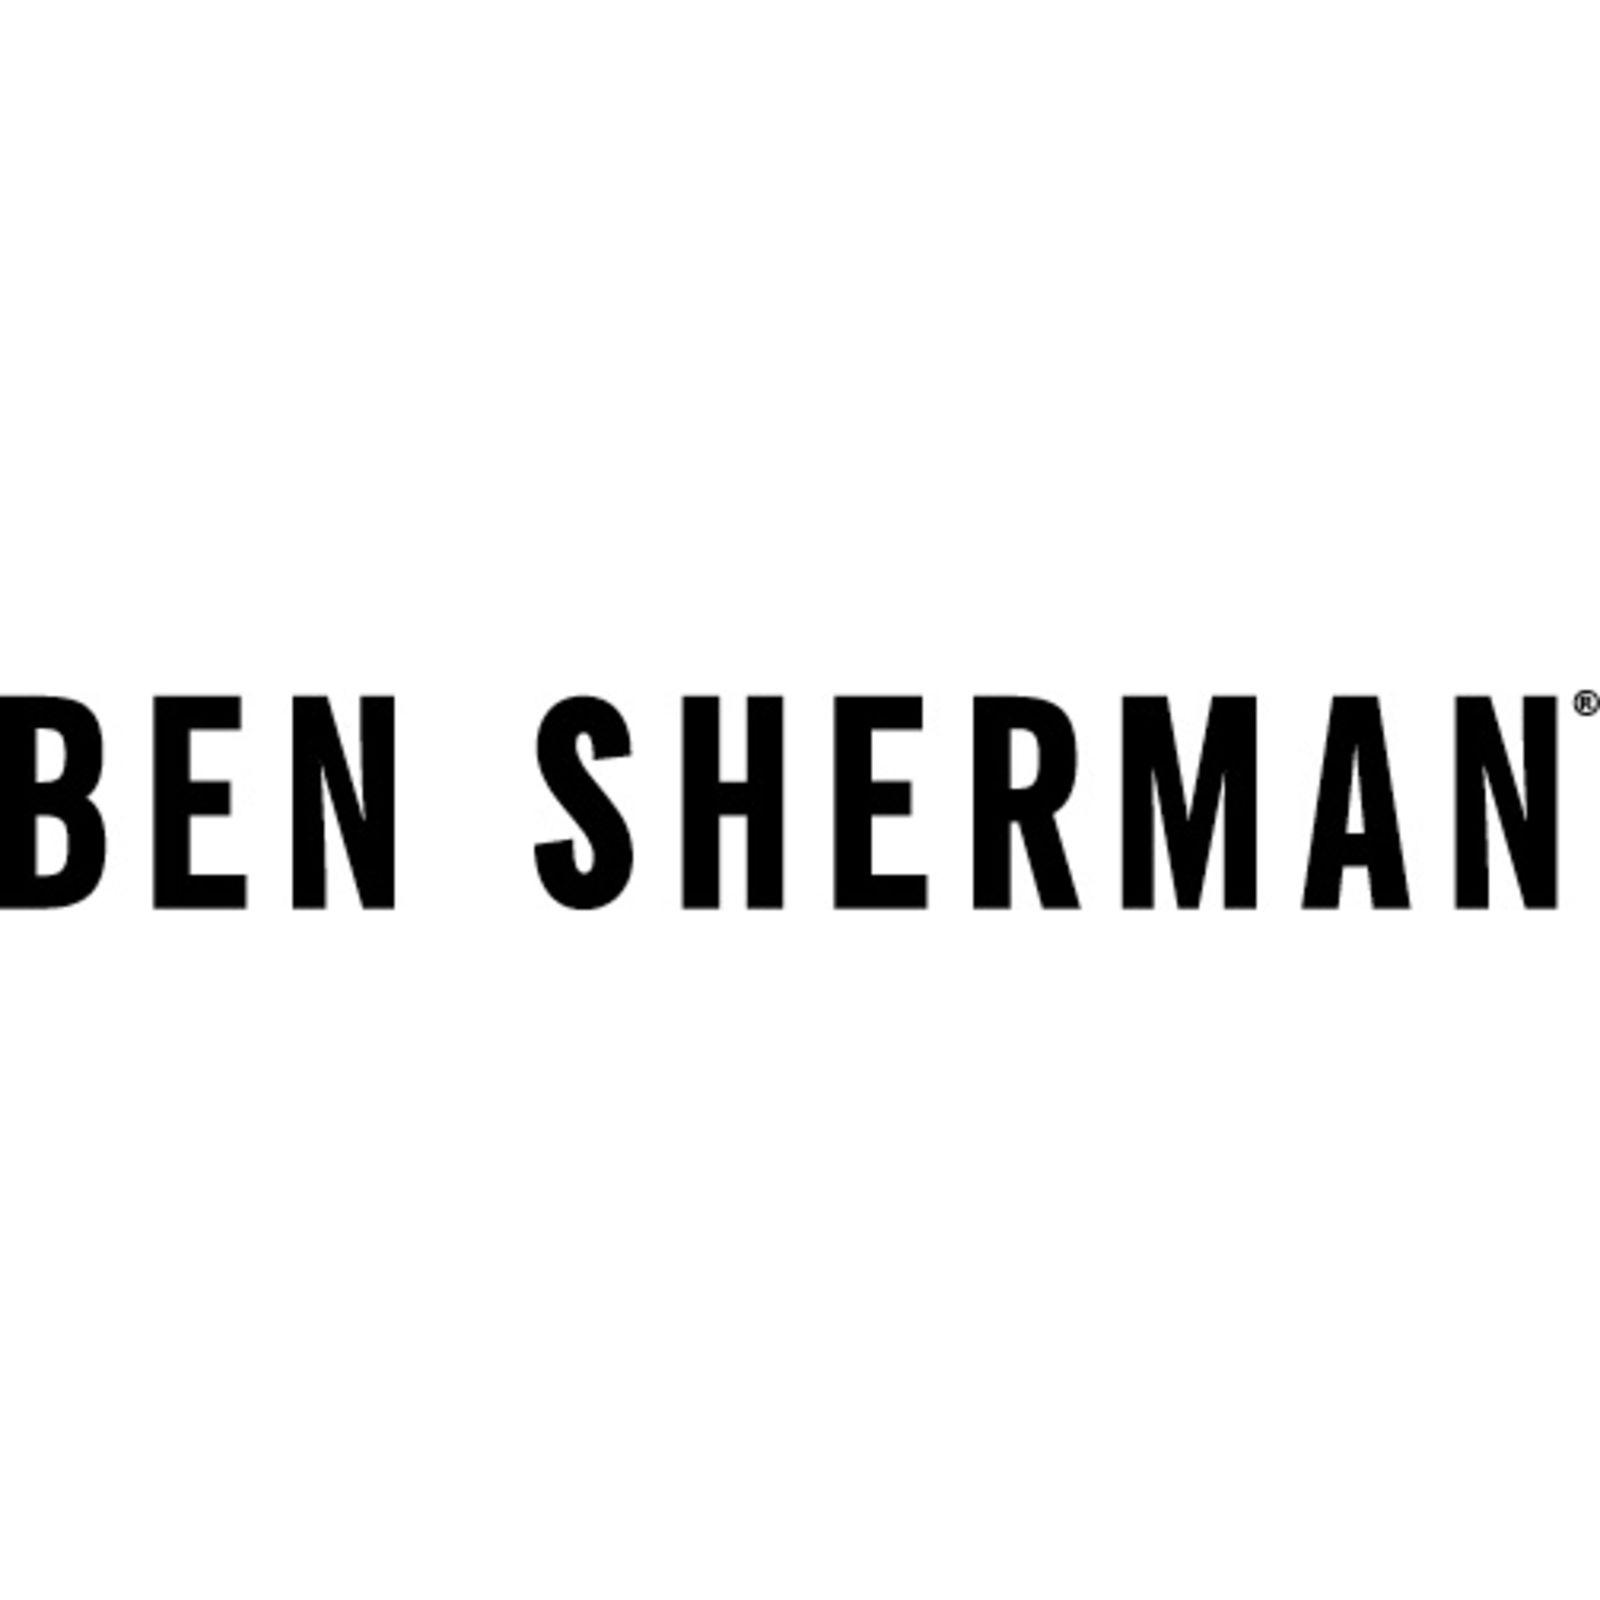 BEN SHERMAN (Bild 1)